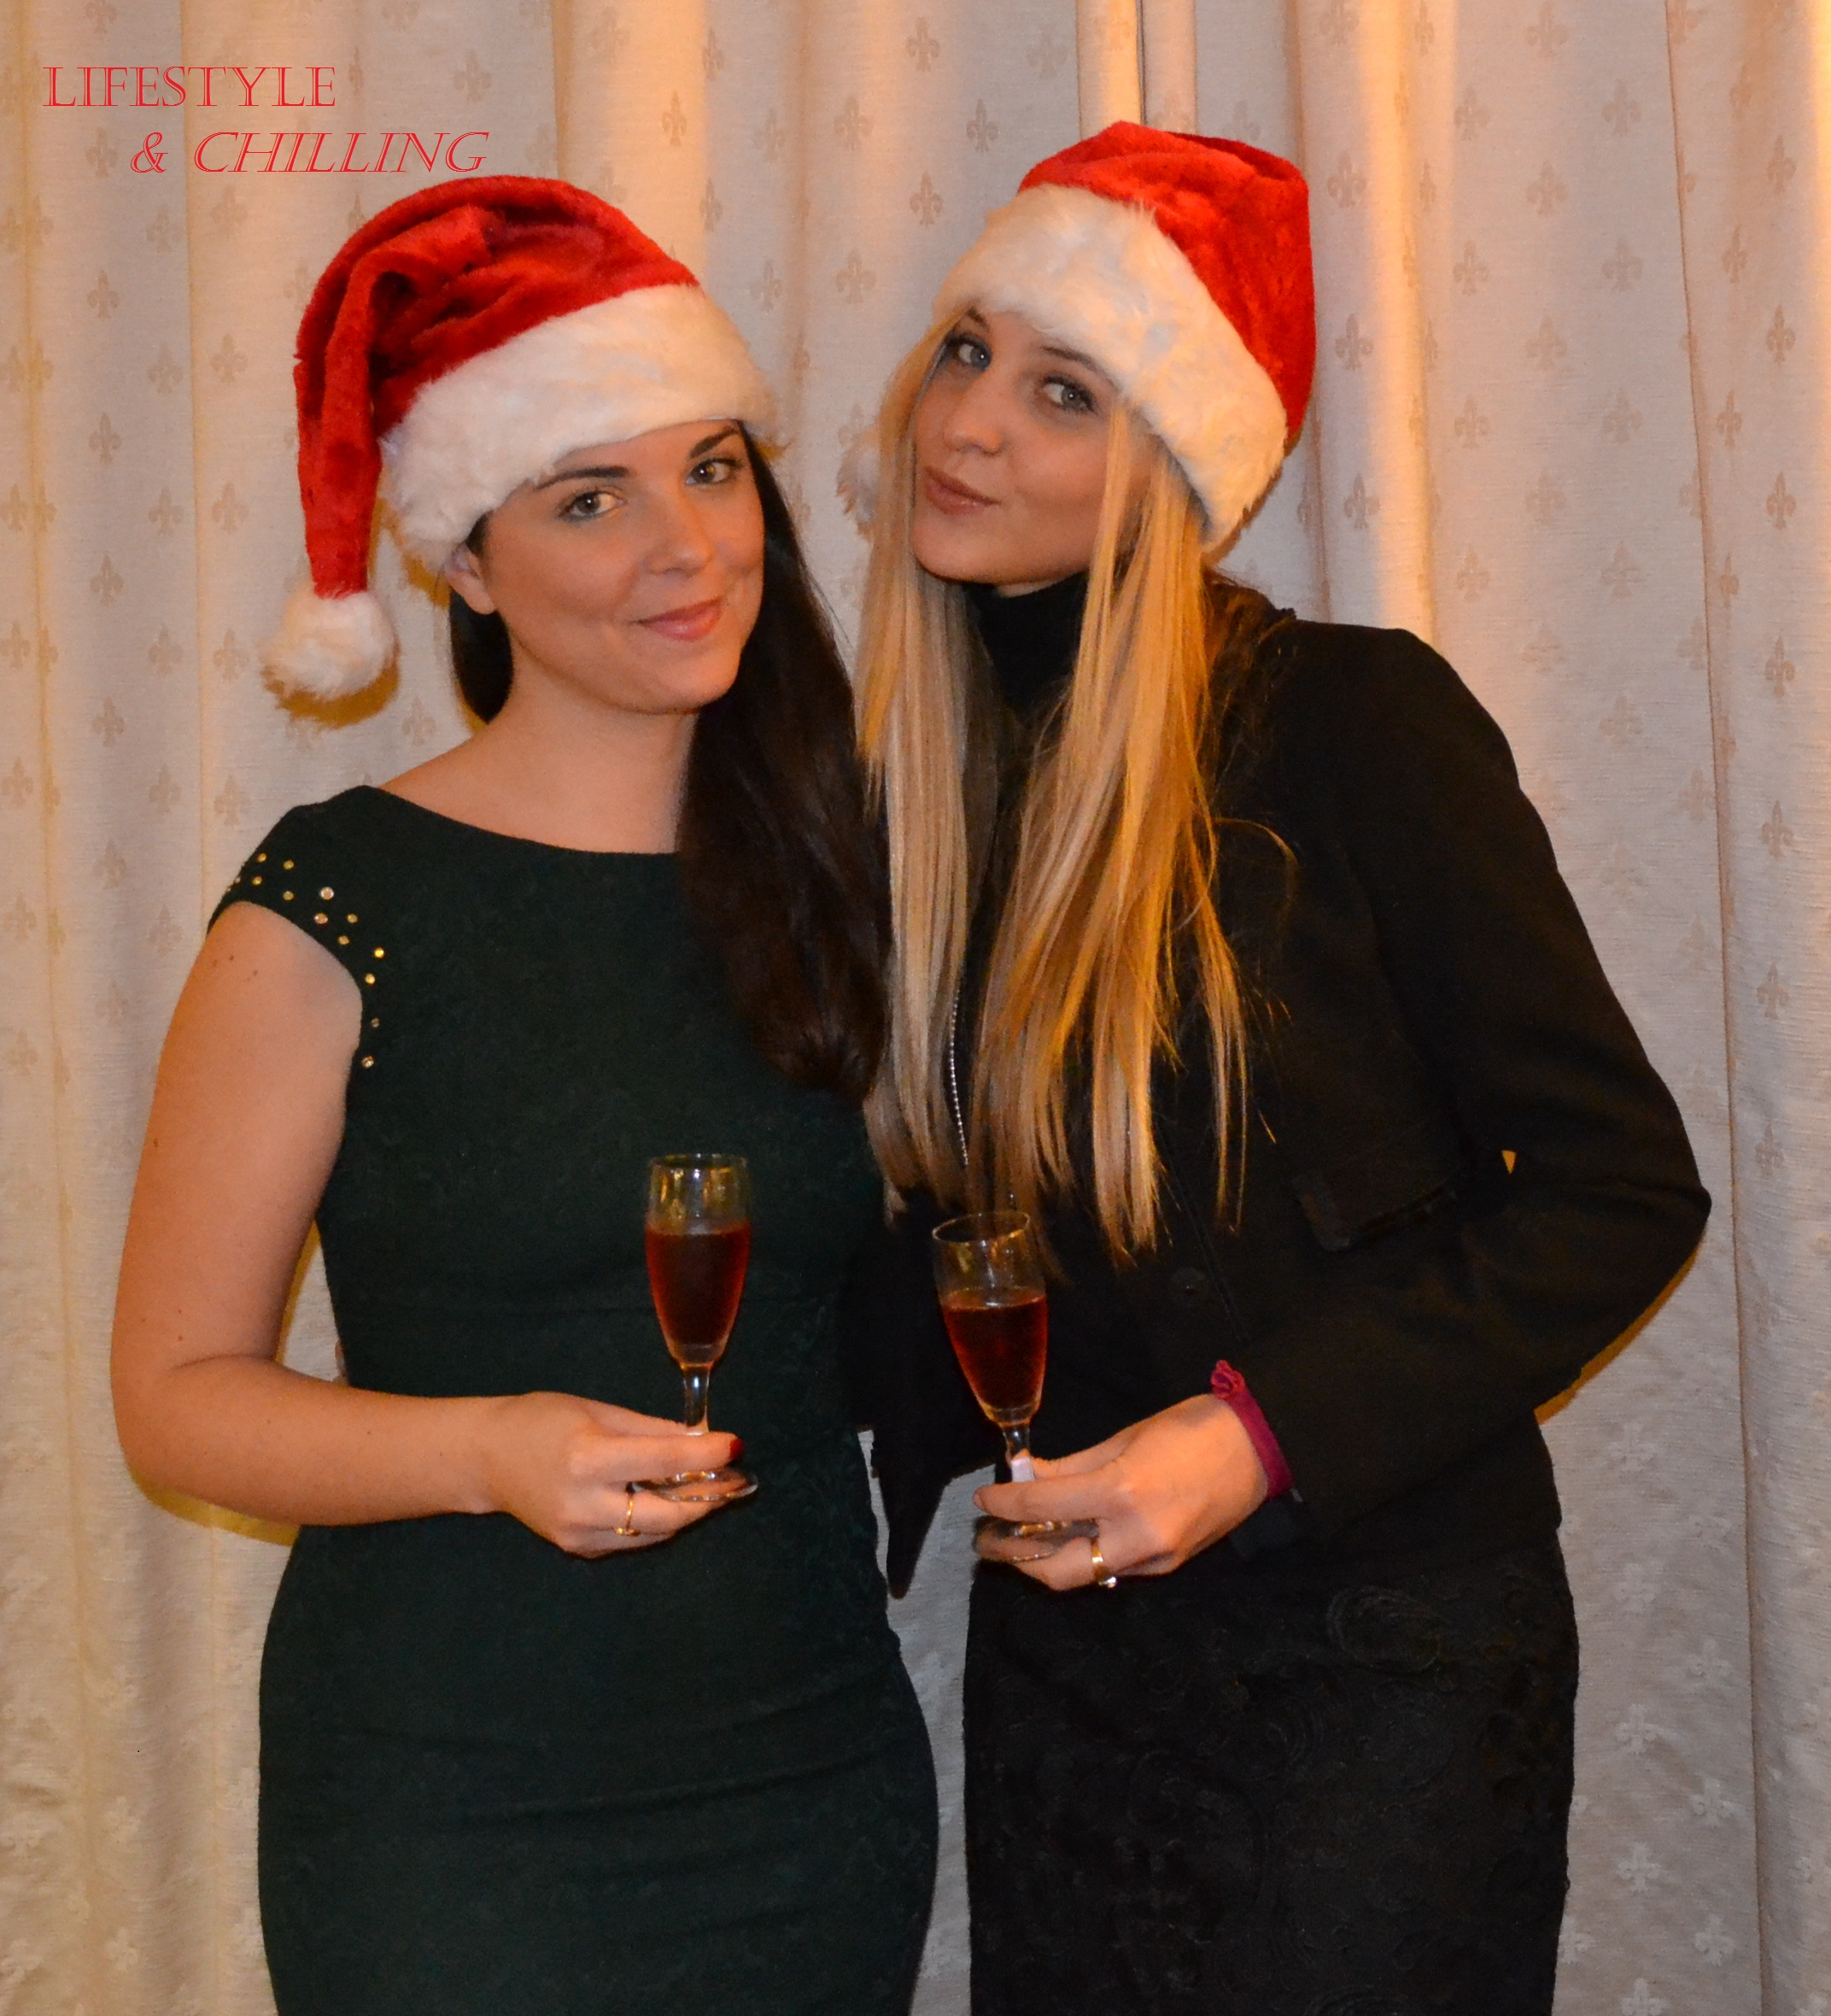 Merry Xmas lifestyleandchilling.net